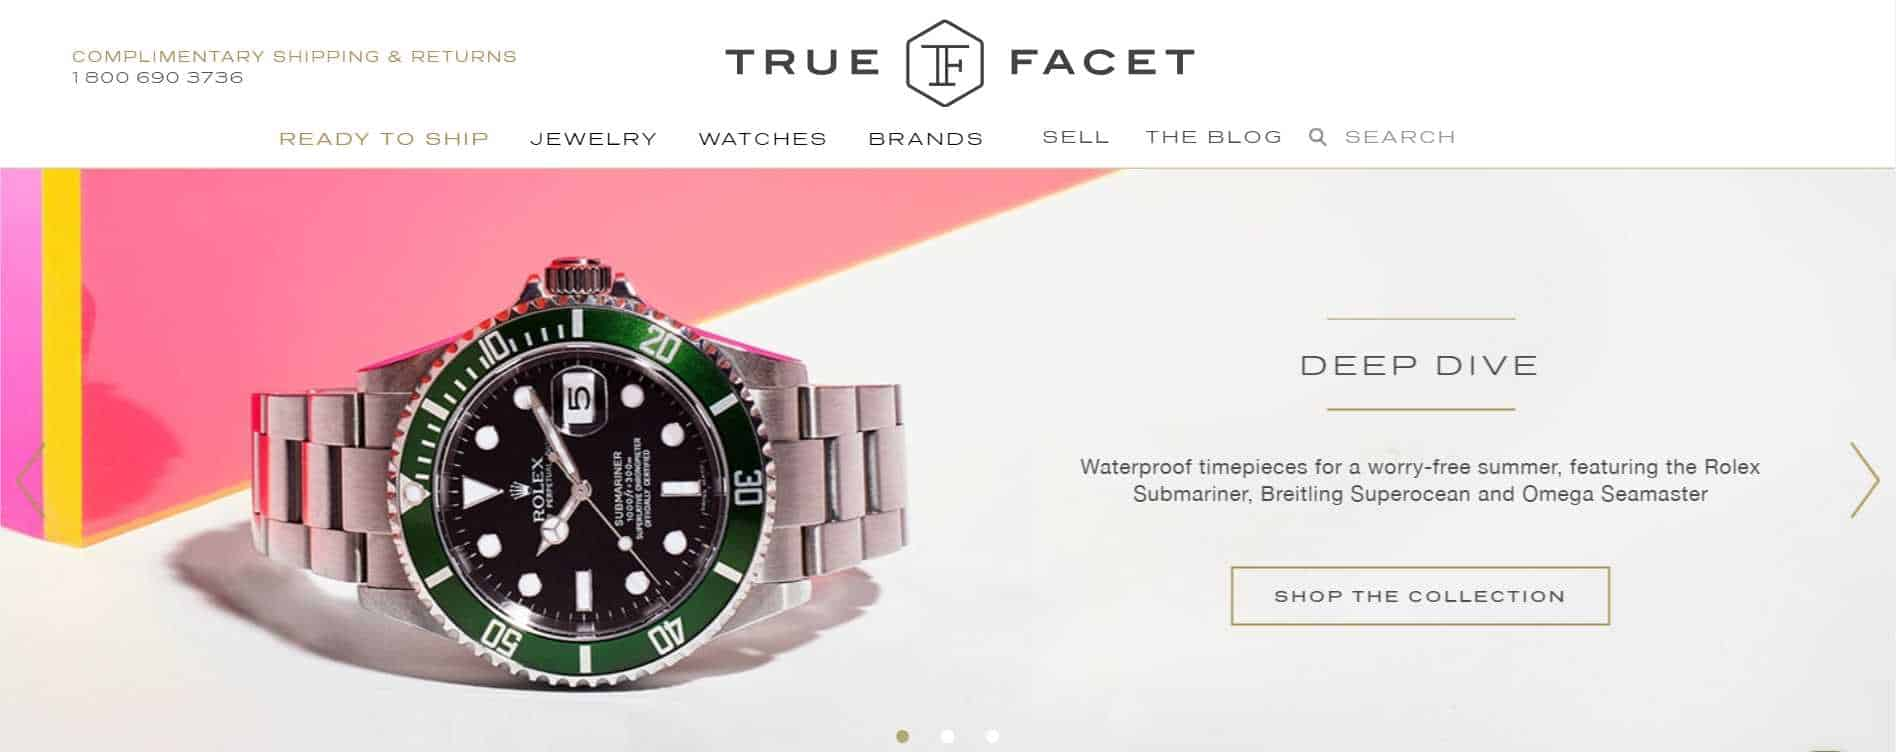 truefacet luxury watches online black friday 2018